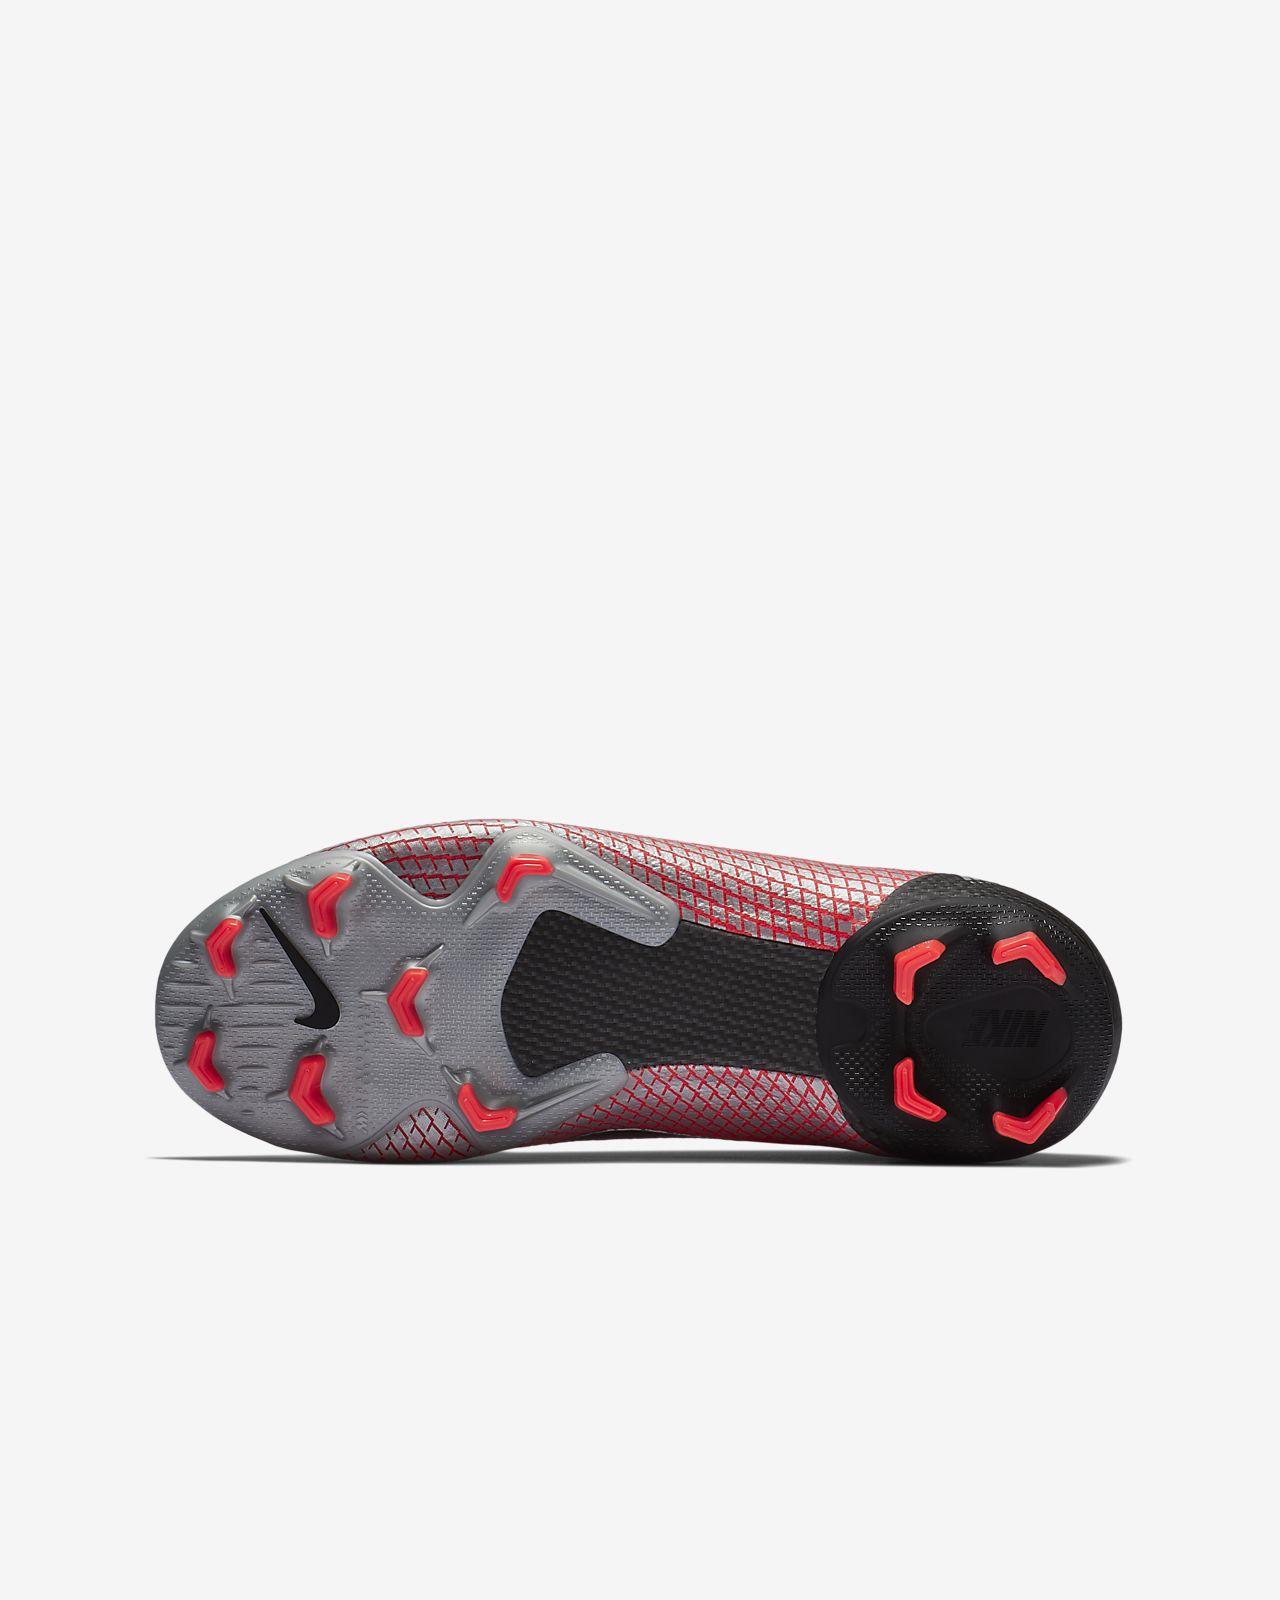 best loved 71c07 9fb3f ... Nike Jr. Superfly 6 Elite CR7 Older Kids Firm-Ground Football Boot